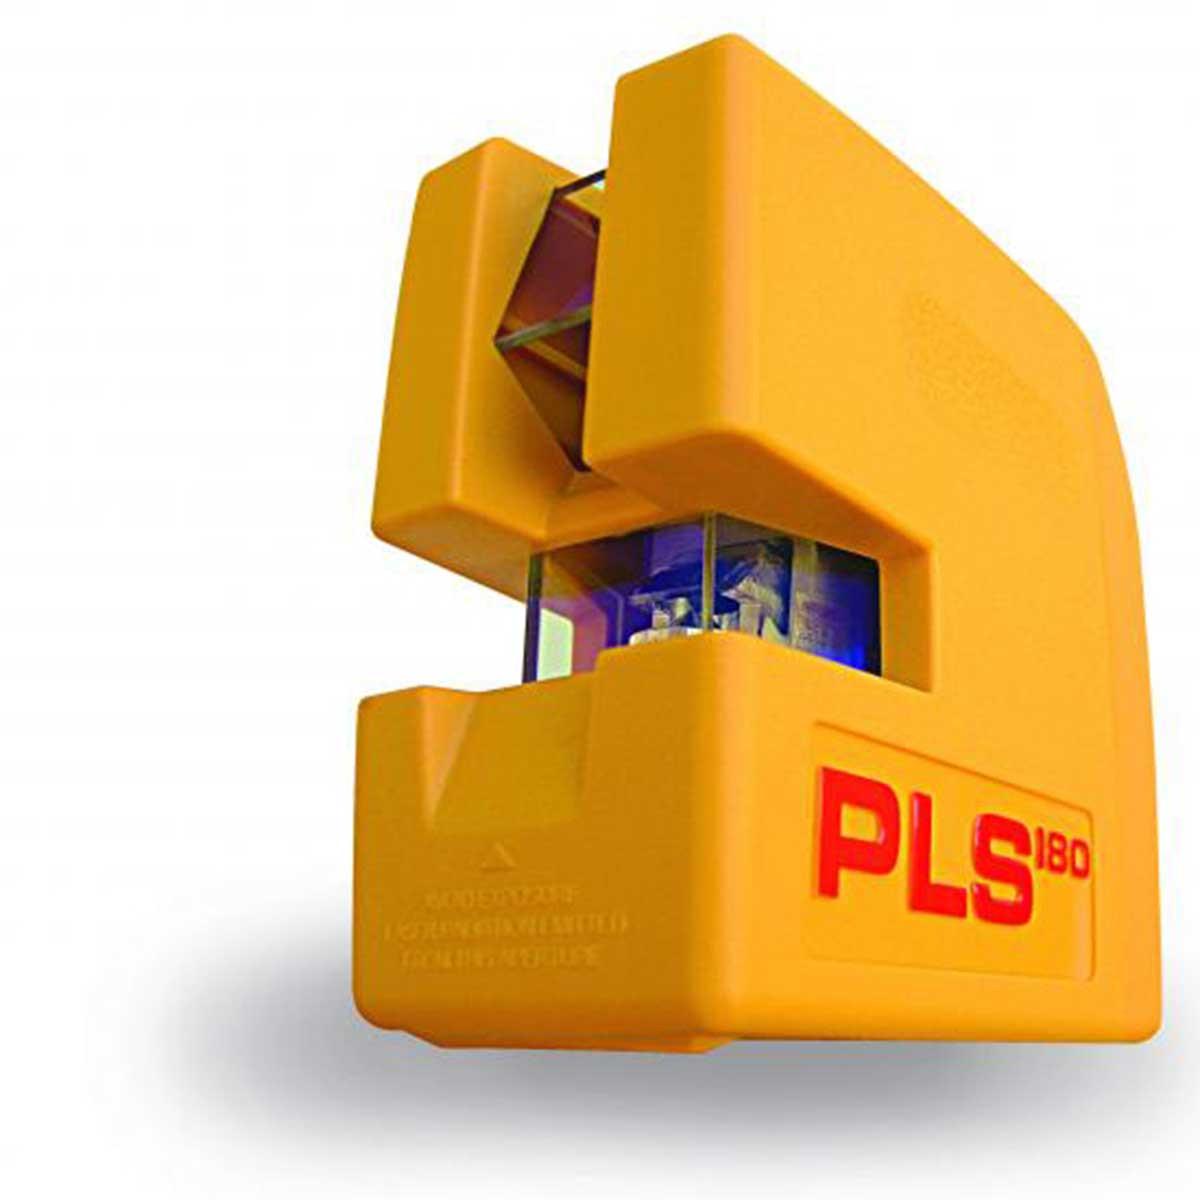 100ft range precision laser PLS180